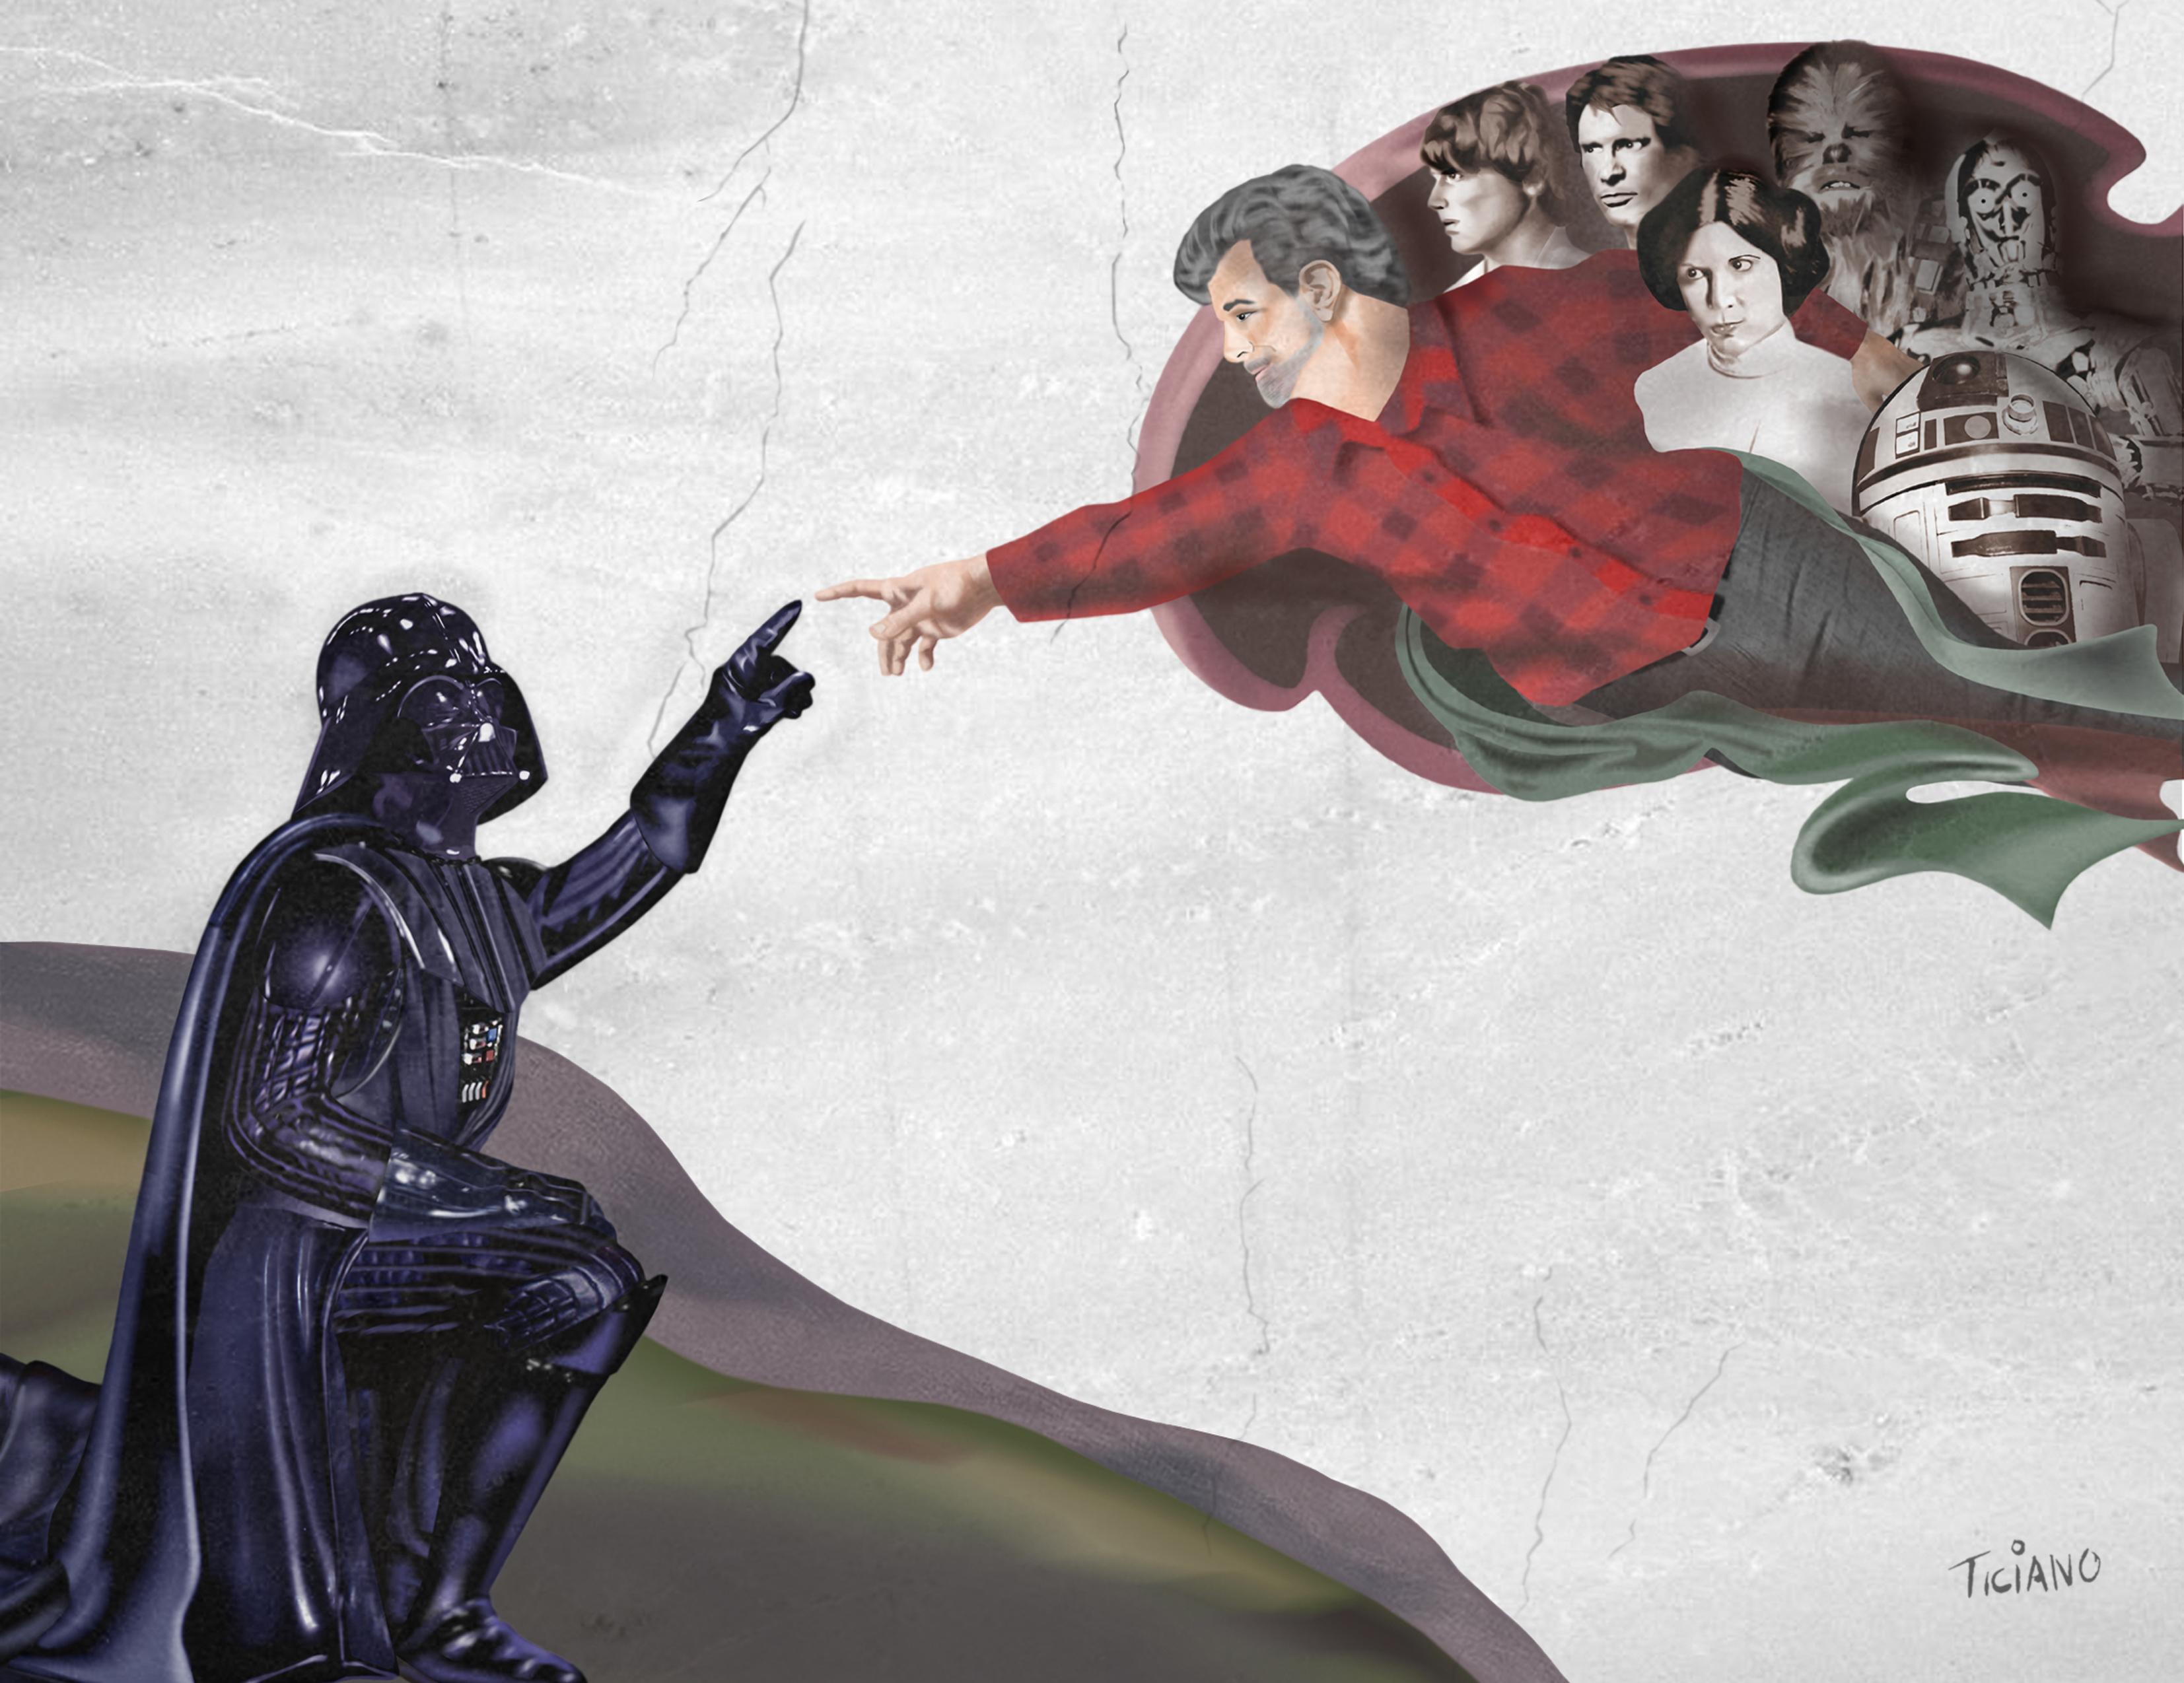 Darth Vader Creation by Ticiano